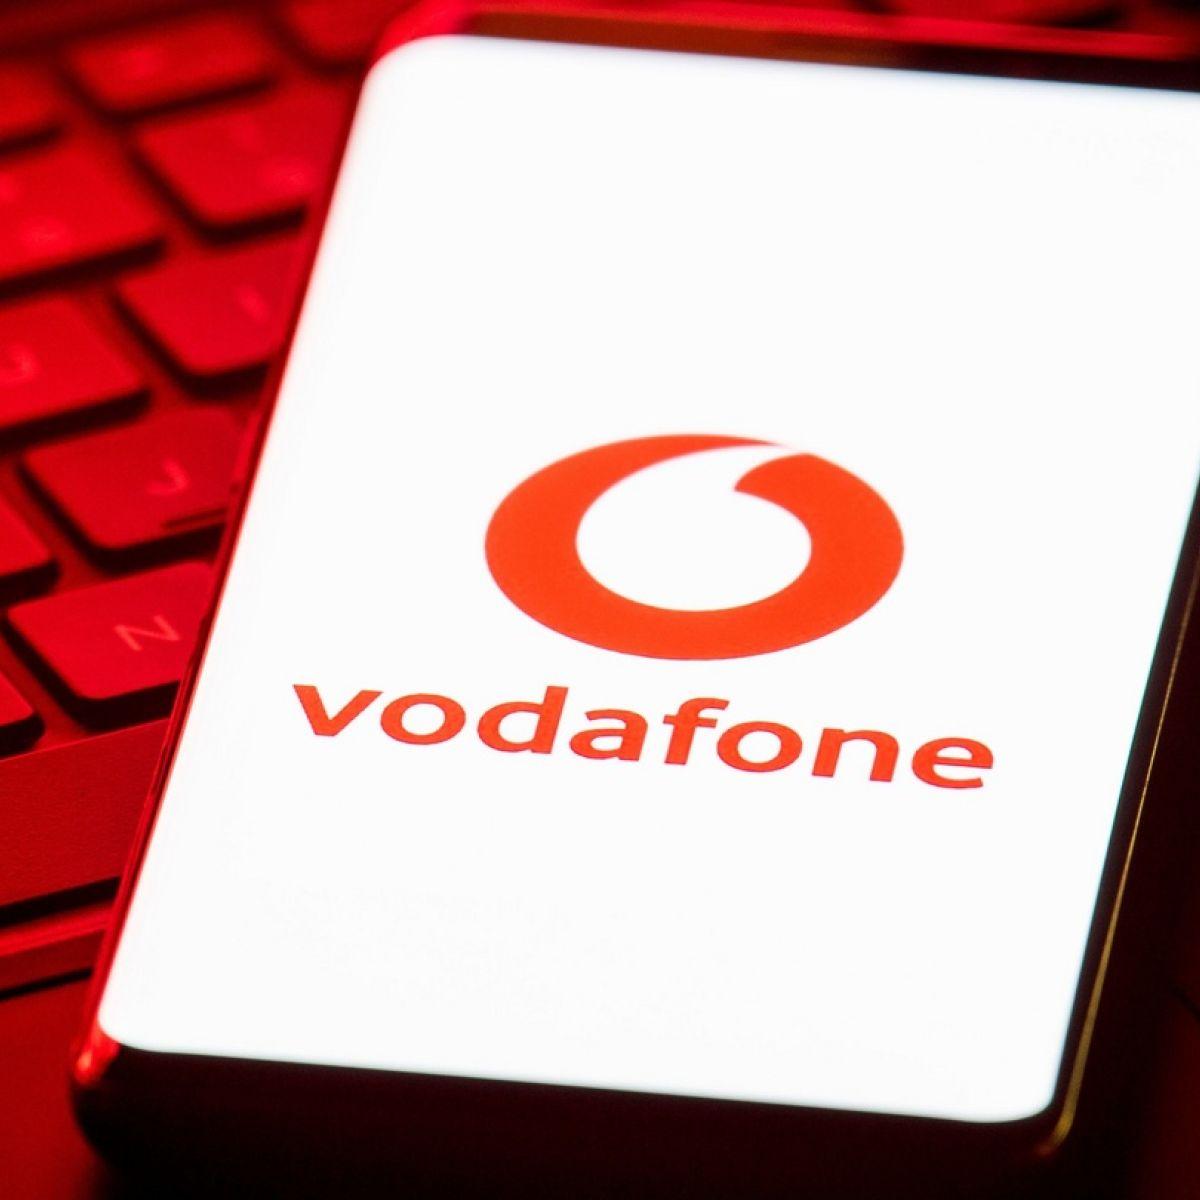 Vodafone resolves major global outage